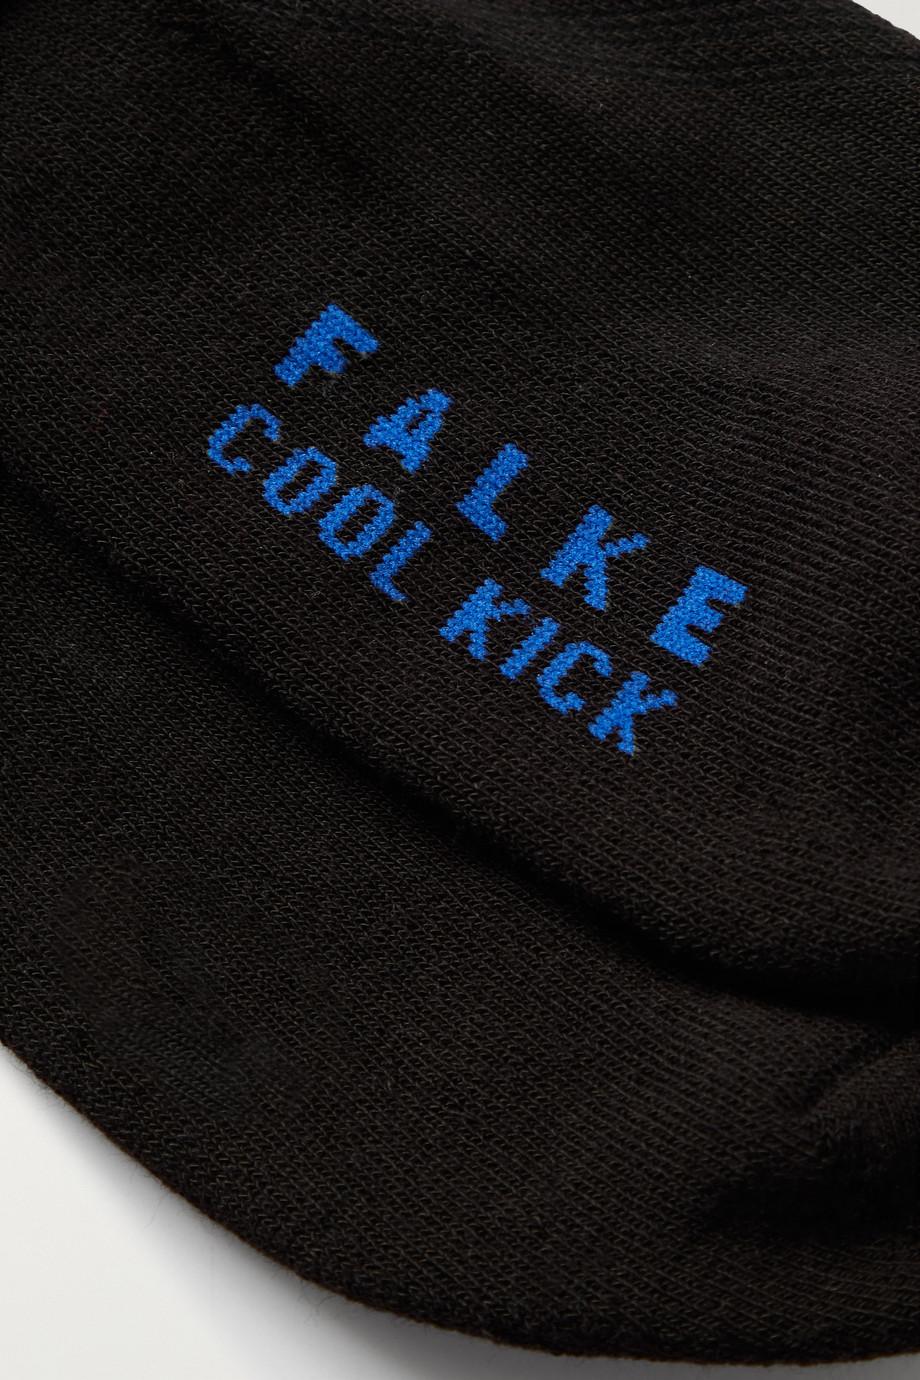 FALKE Cool Kick set of three knitted socks